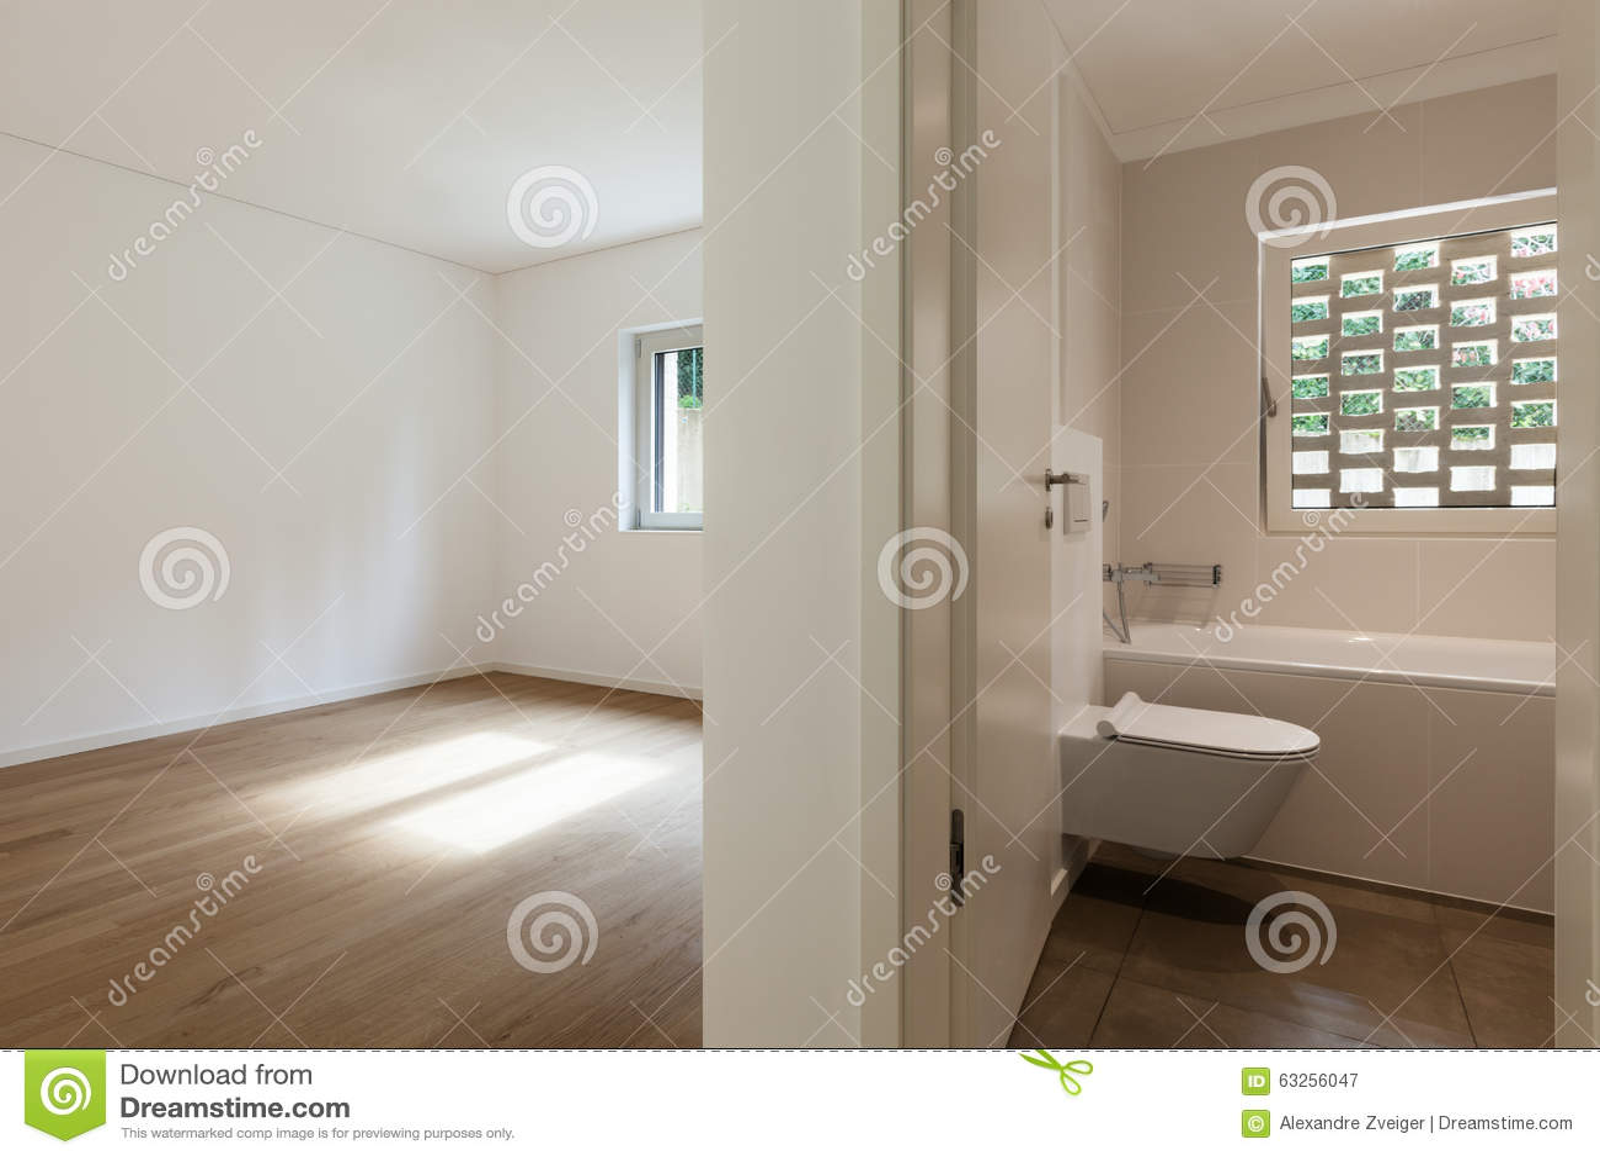 Interior Empty Room With Bathroom Stock Image  Image of domestic parquet 63256047